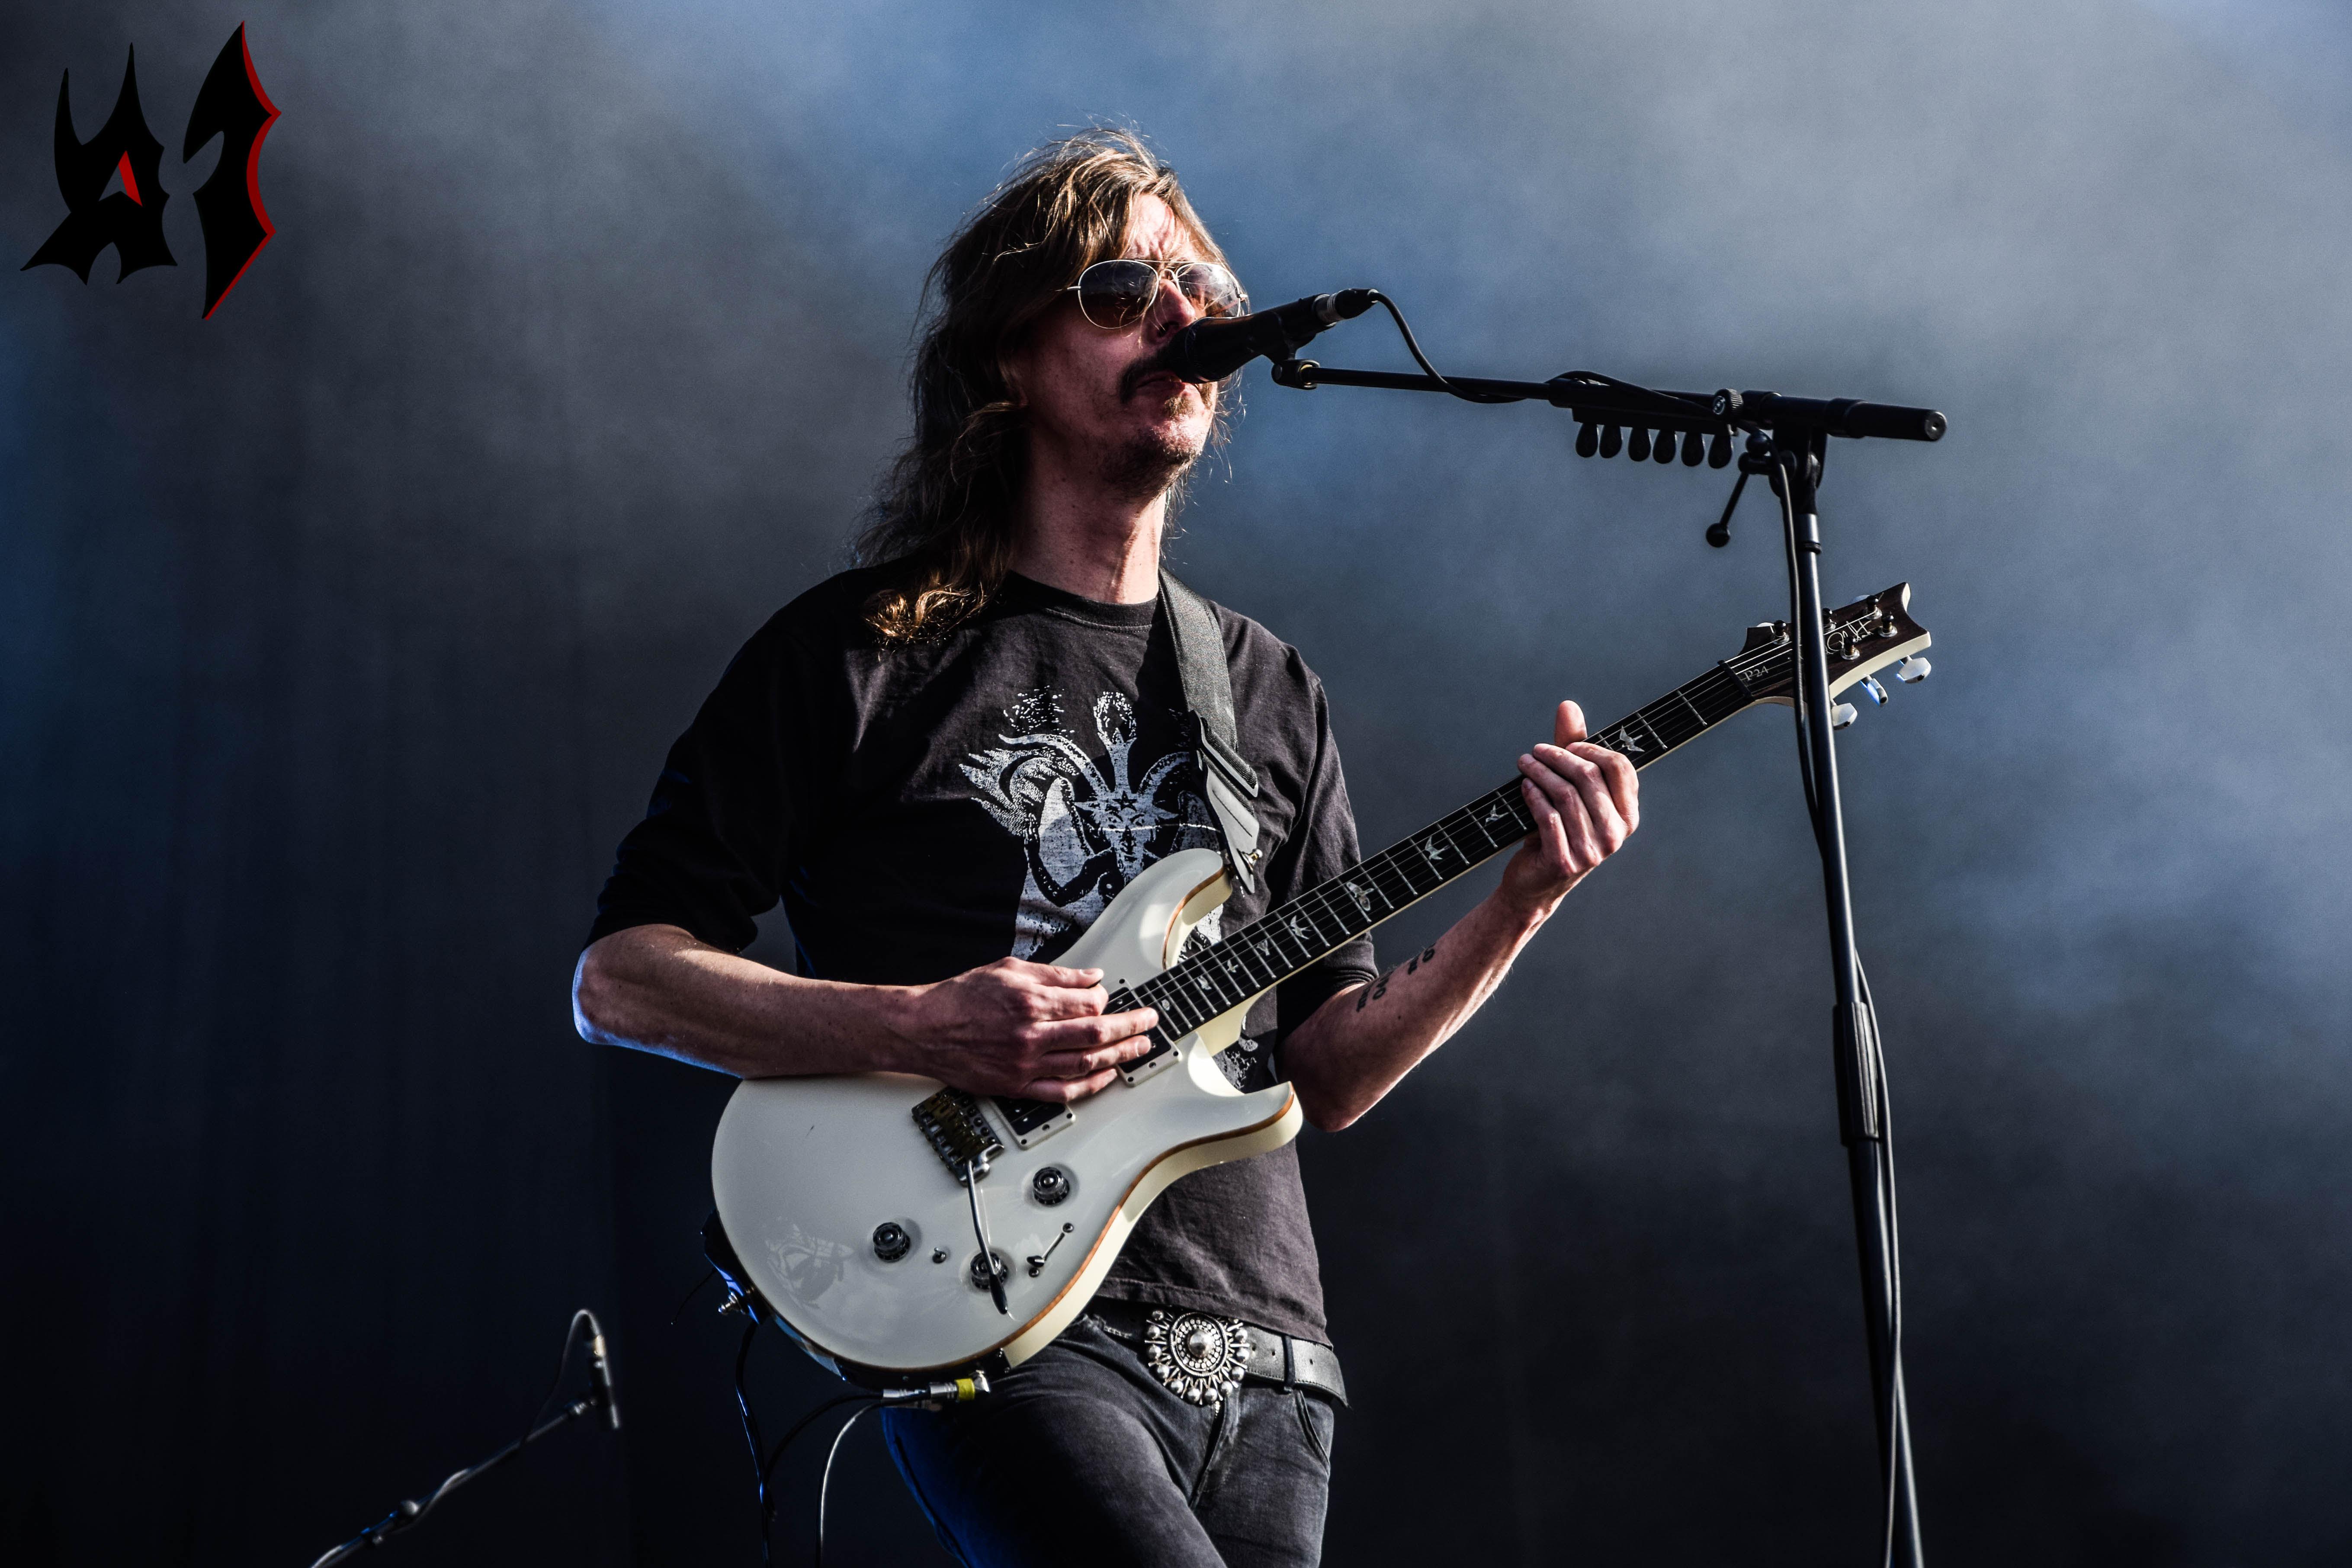 Donwload 2018 – Day 1 - Opeth 15